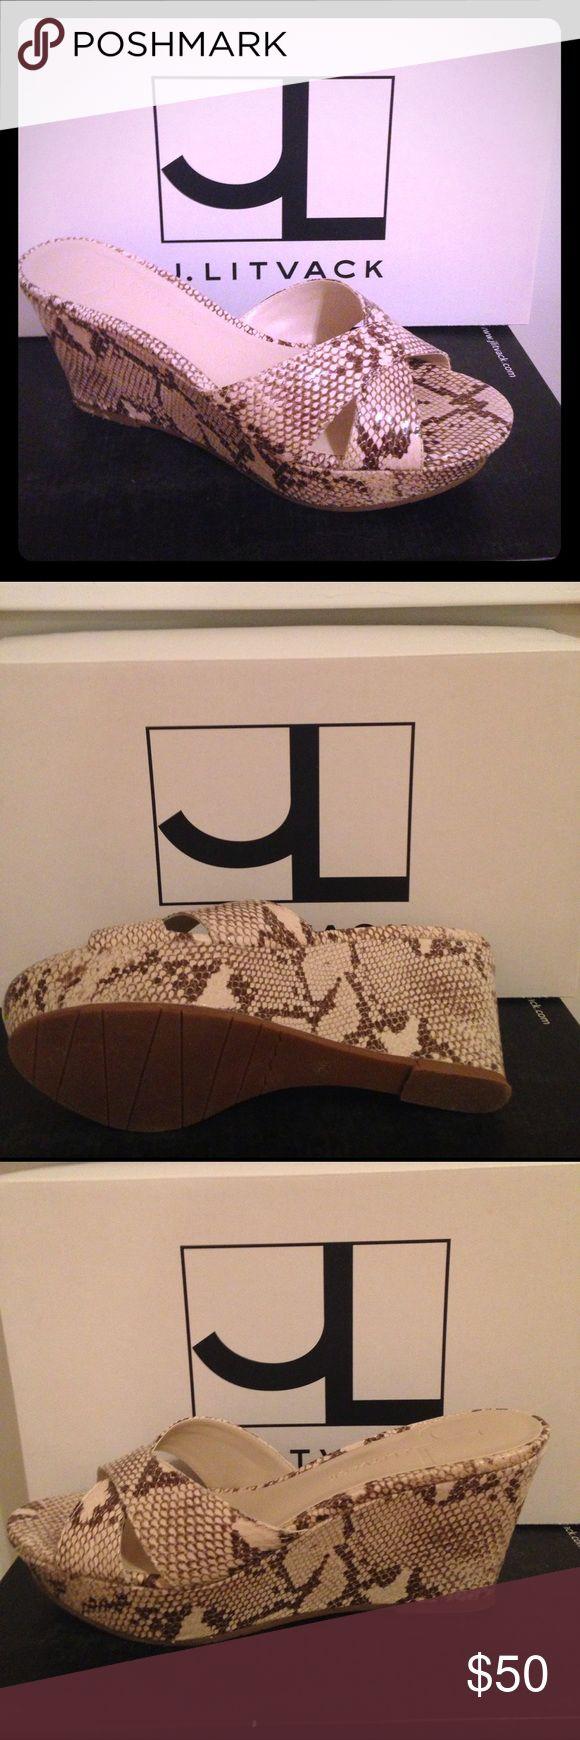 J.litvack shoes J.Litvack style: sutton color: natural Python wedge Shoes Wedges